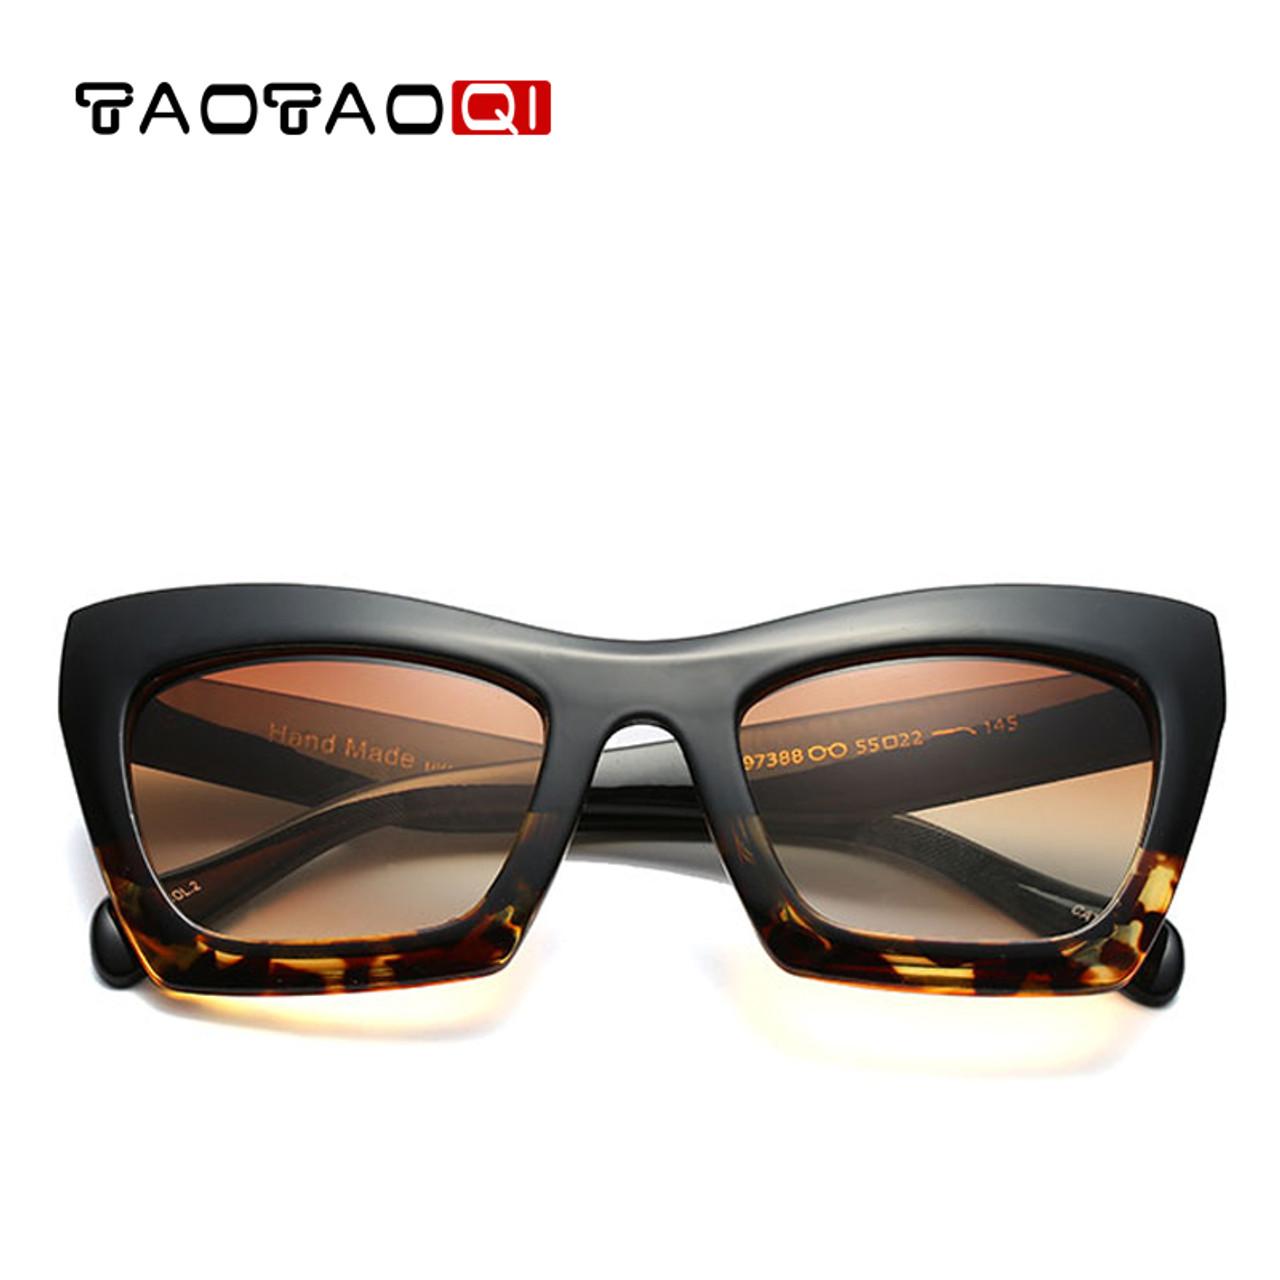 c7e8b1dd613 TAOTAOQI Square Cat eyewear Women s Sunglasses Fashion Sunglasses Women  Brand Designer UV400 Large Frame Glasses Women ...